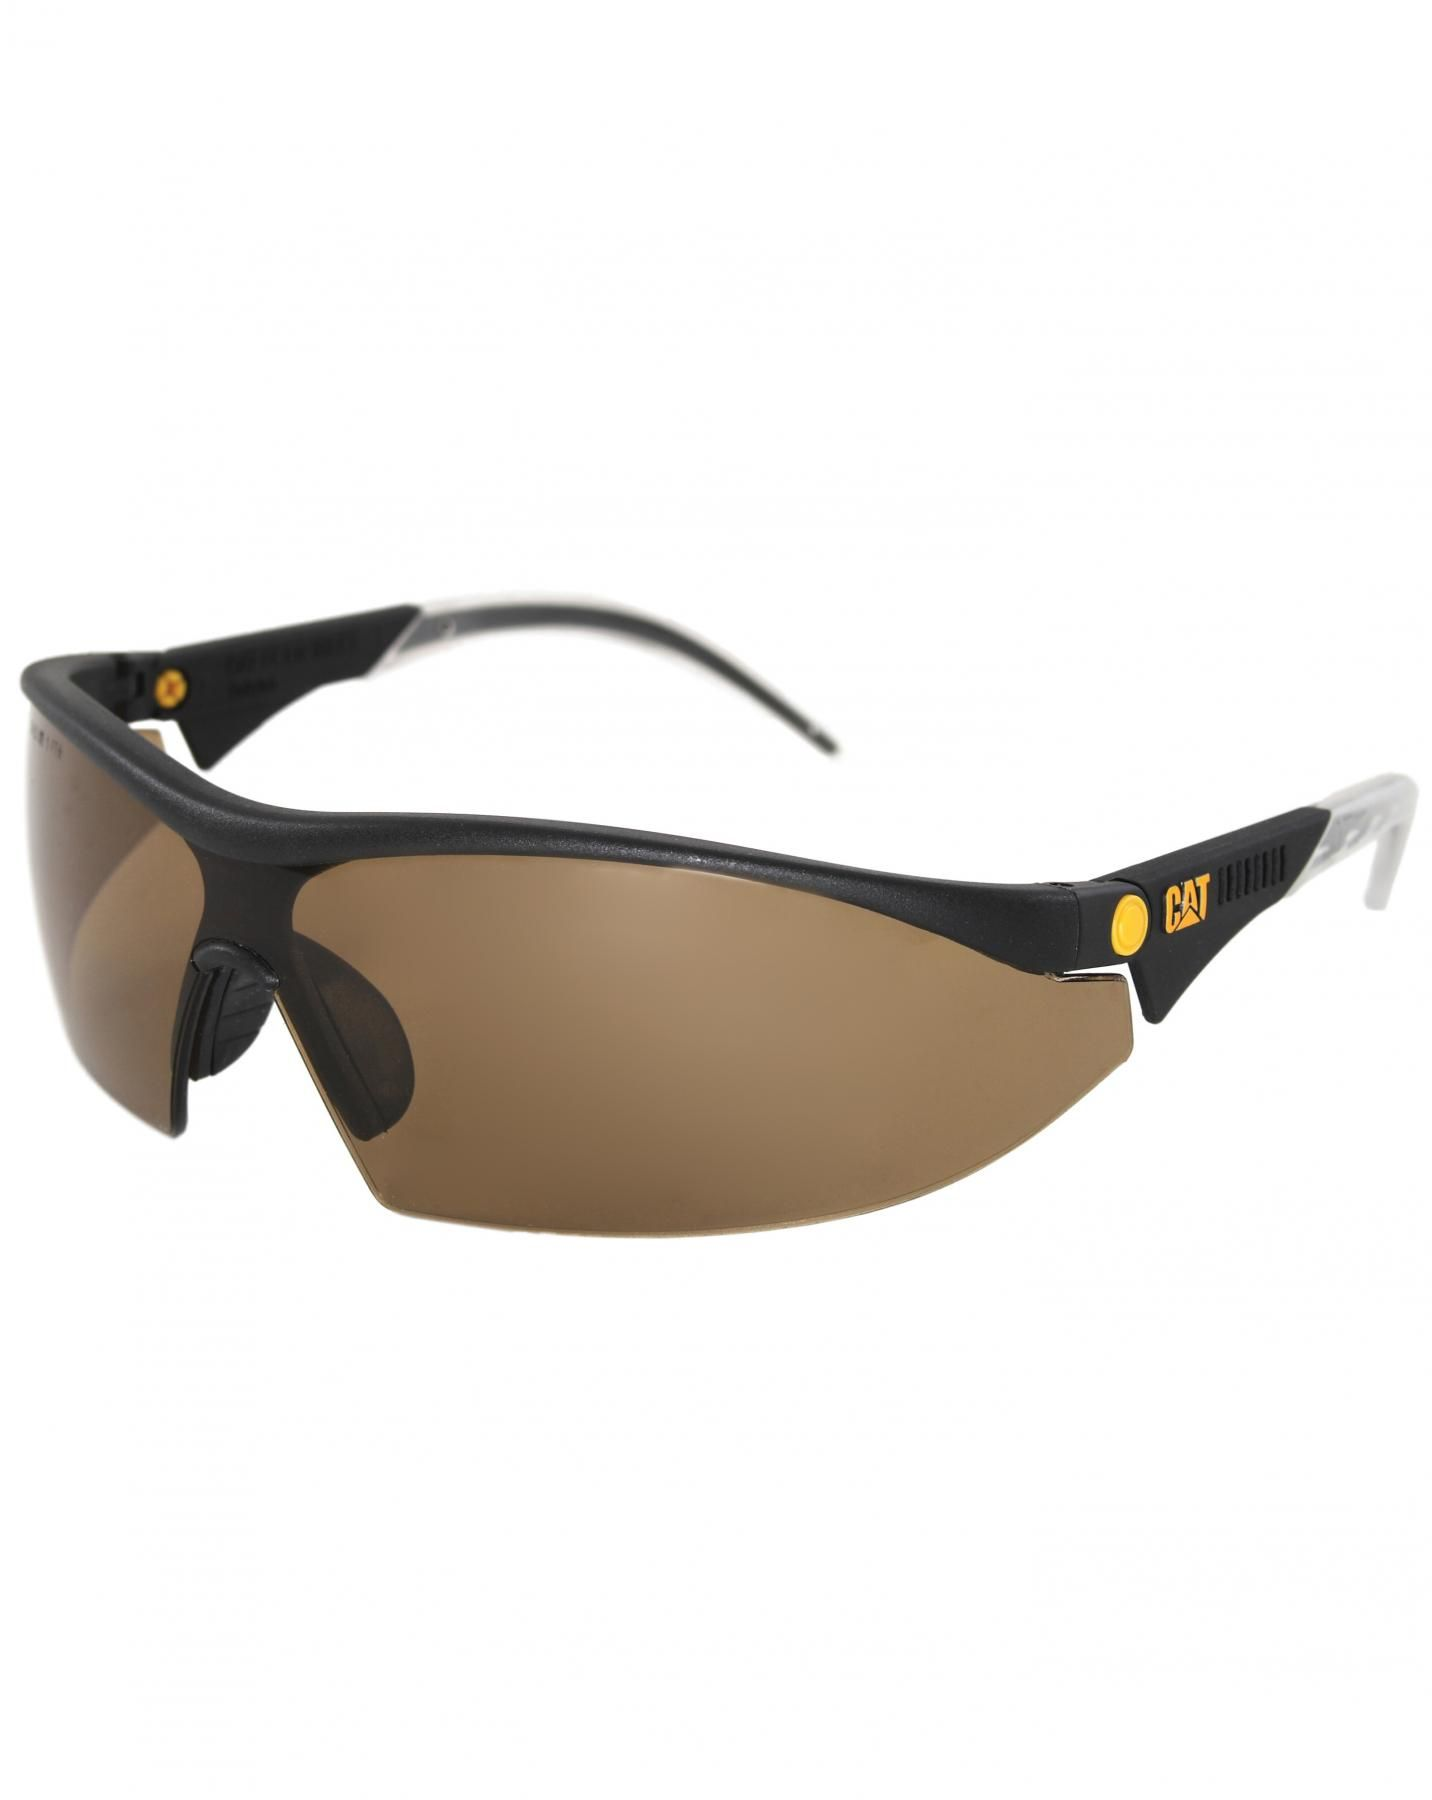 Caterpillar Semi-Rimless Glasses, Eyewear, Brown, Unisex ...